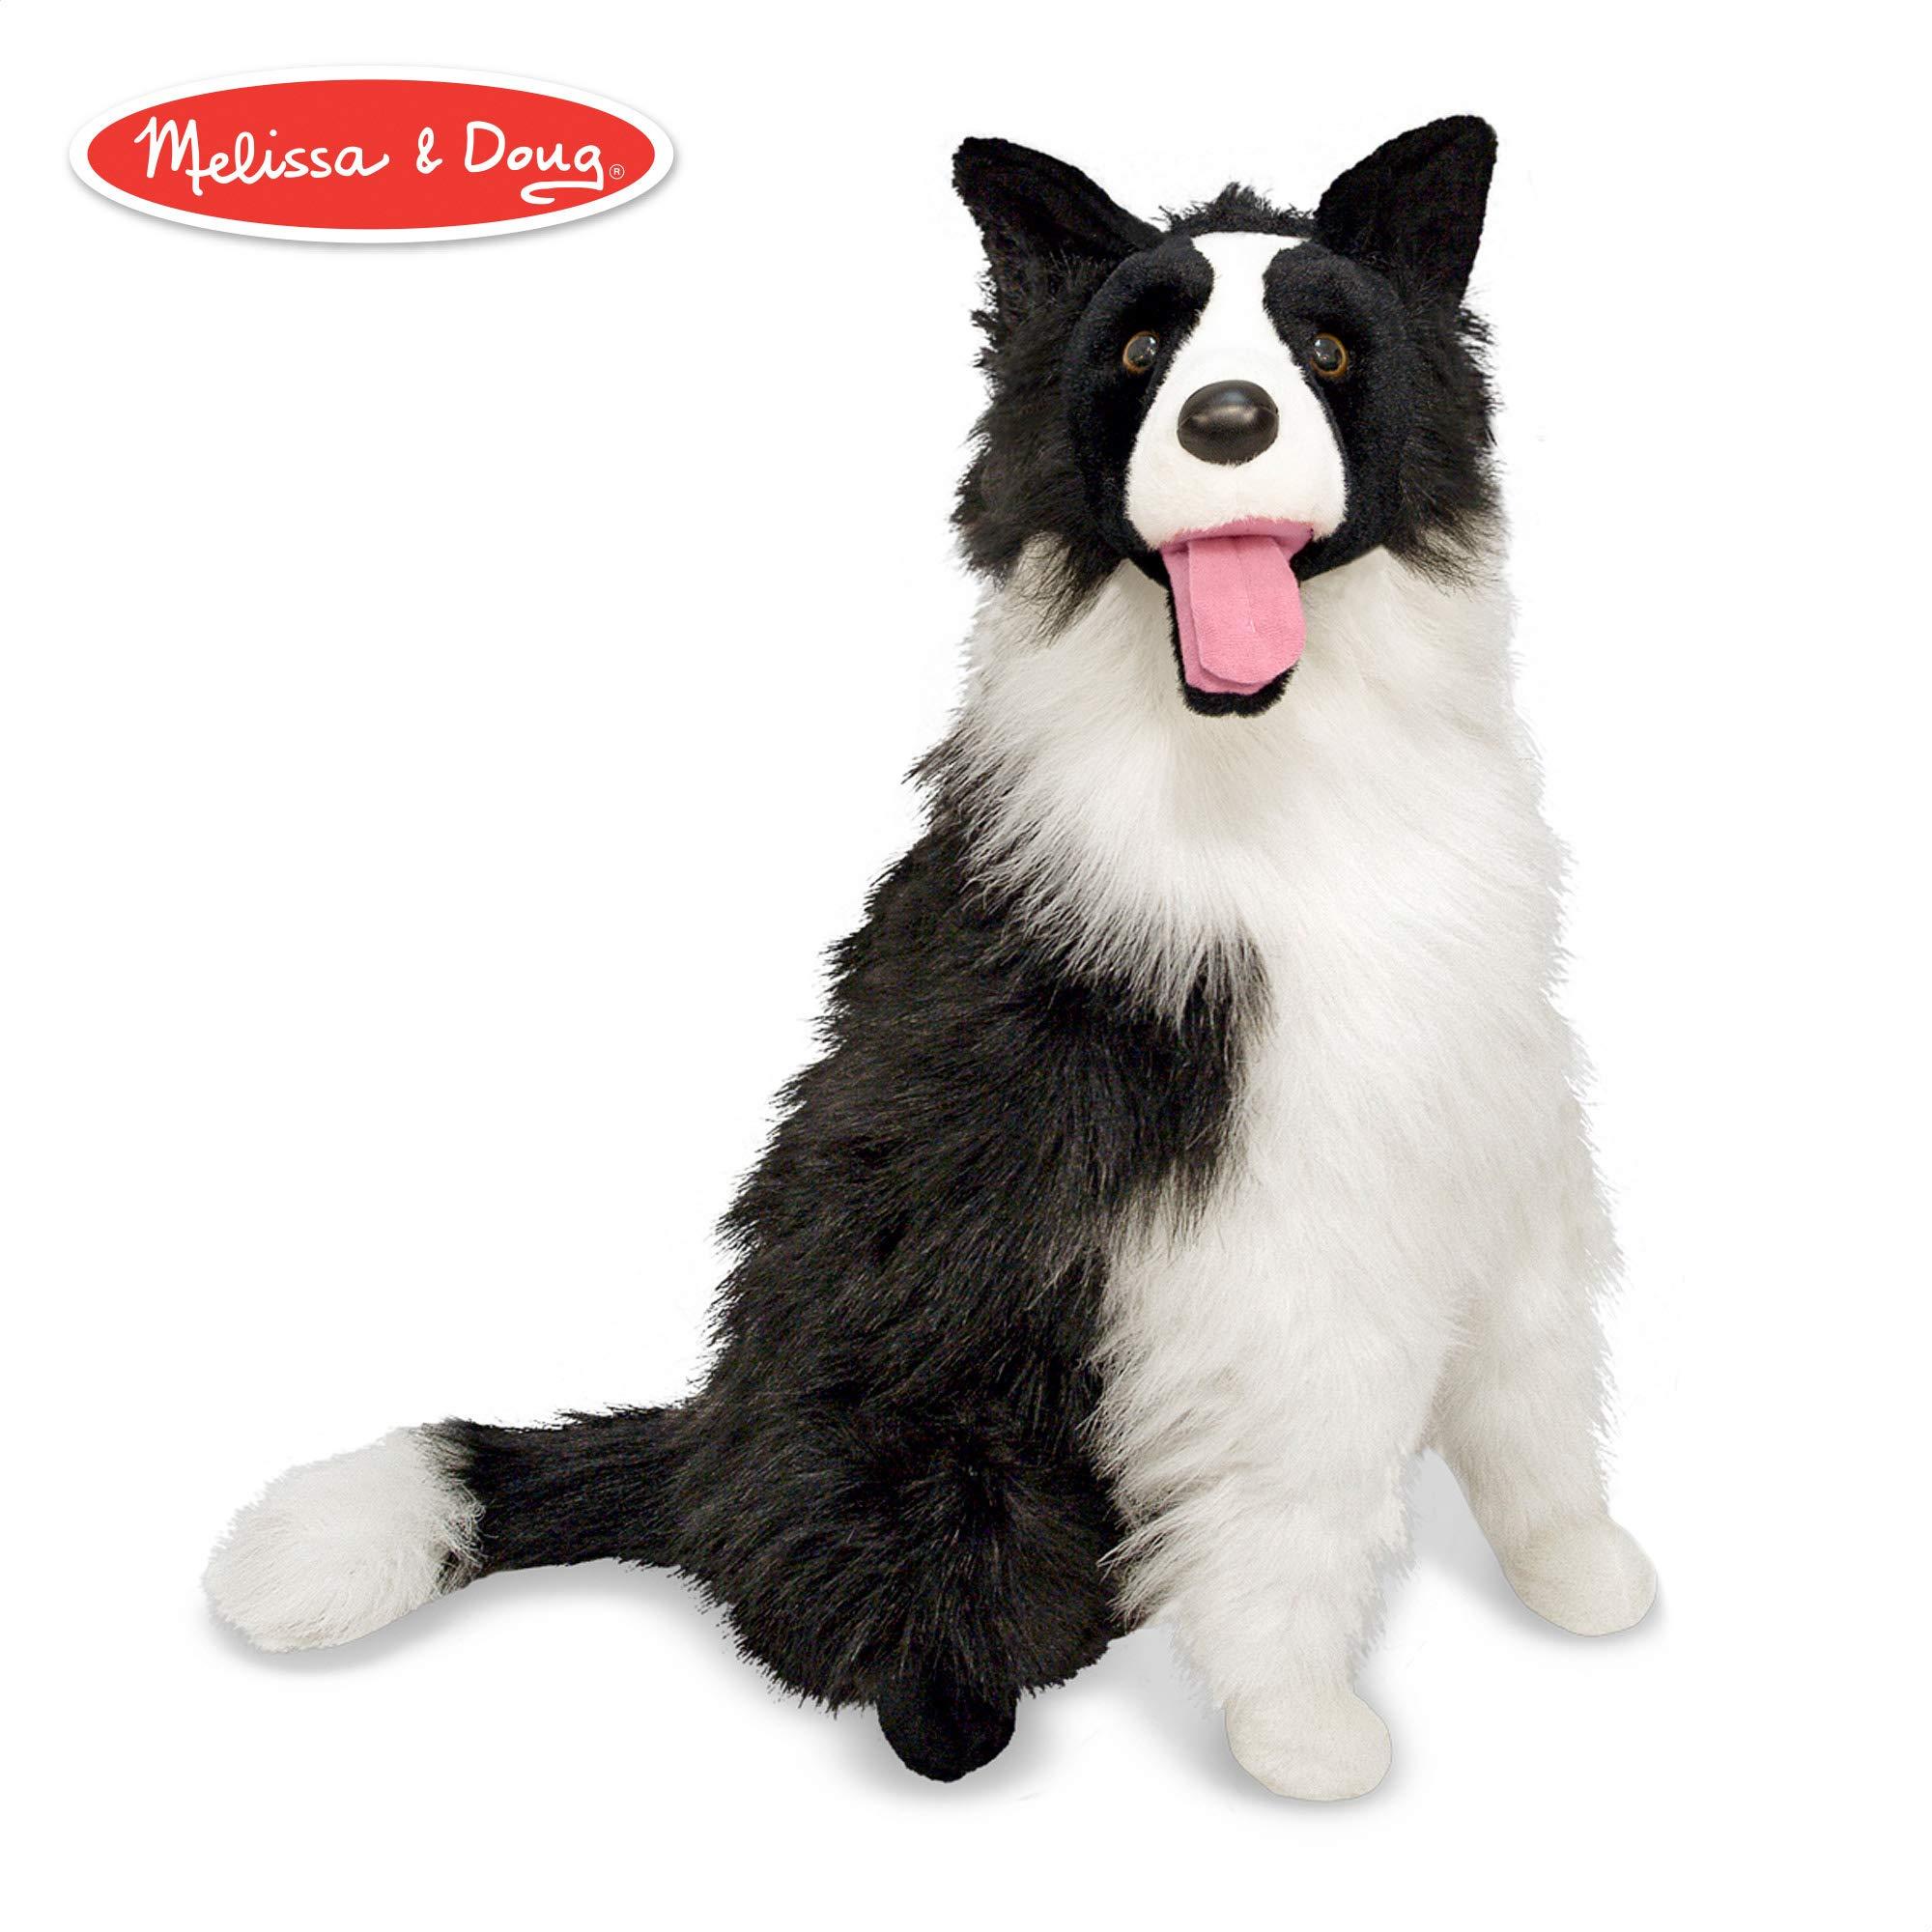 Melissa & Doug Border Collie Dog Giant Stuffed Animal (Lifelike Plush, 27'' H x 22'' W x 14'' L) by Melissa & Doug